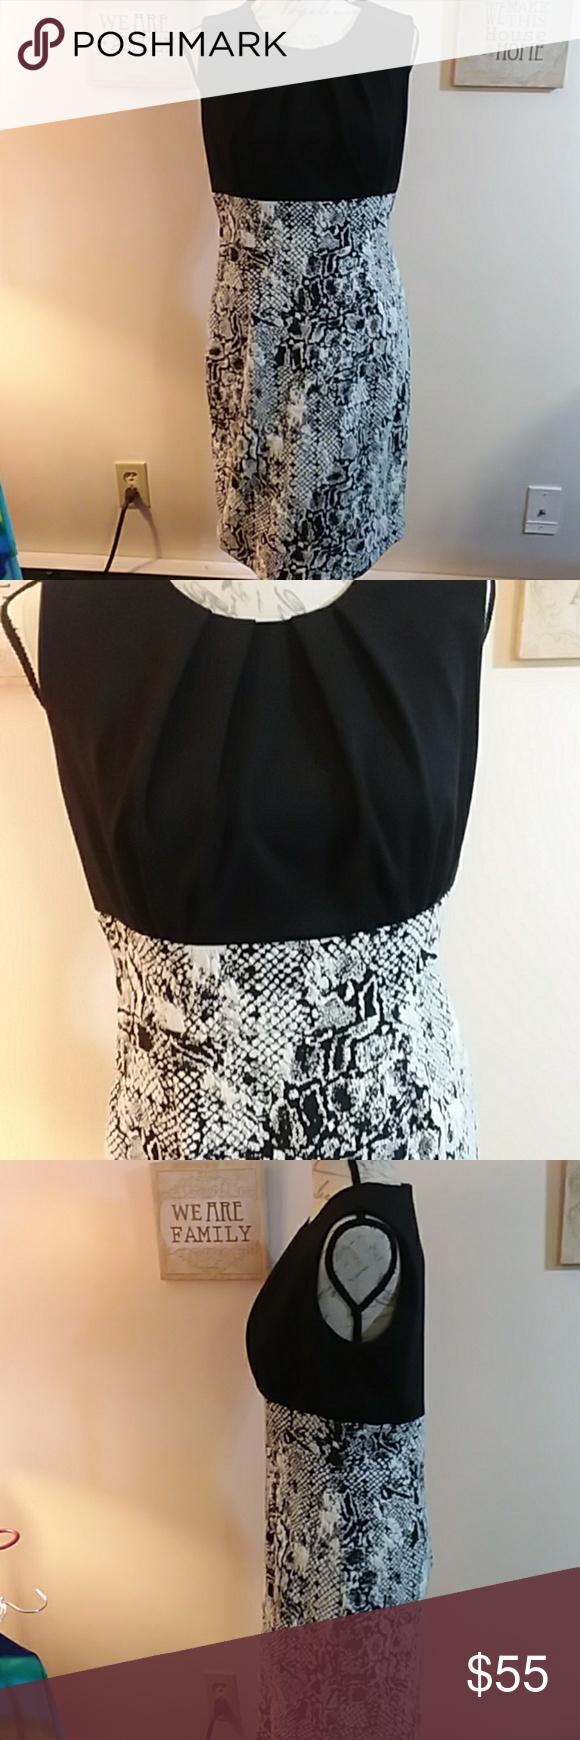 Dress Stein Mart Never Worn Beautiful Dresses Fashion Design Clothes Design [ 1740 x 580 Pixel ]